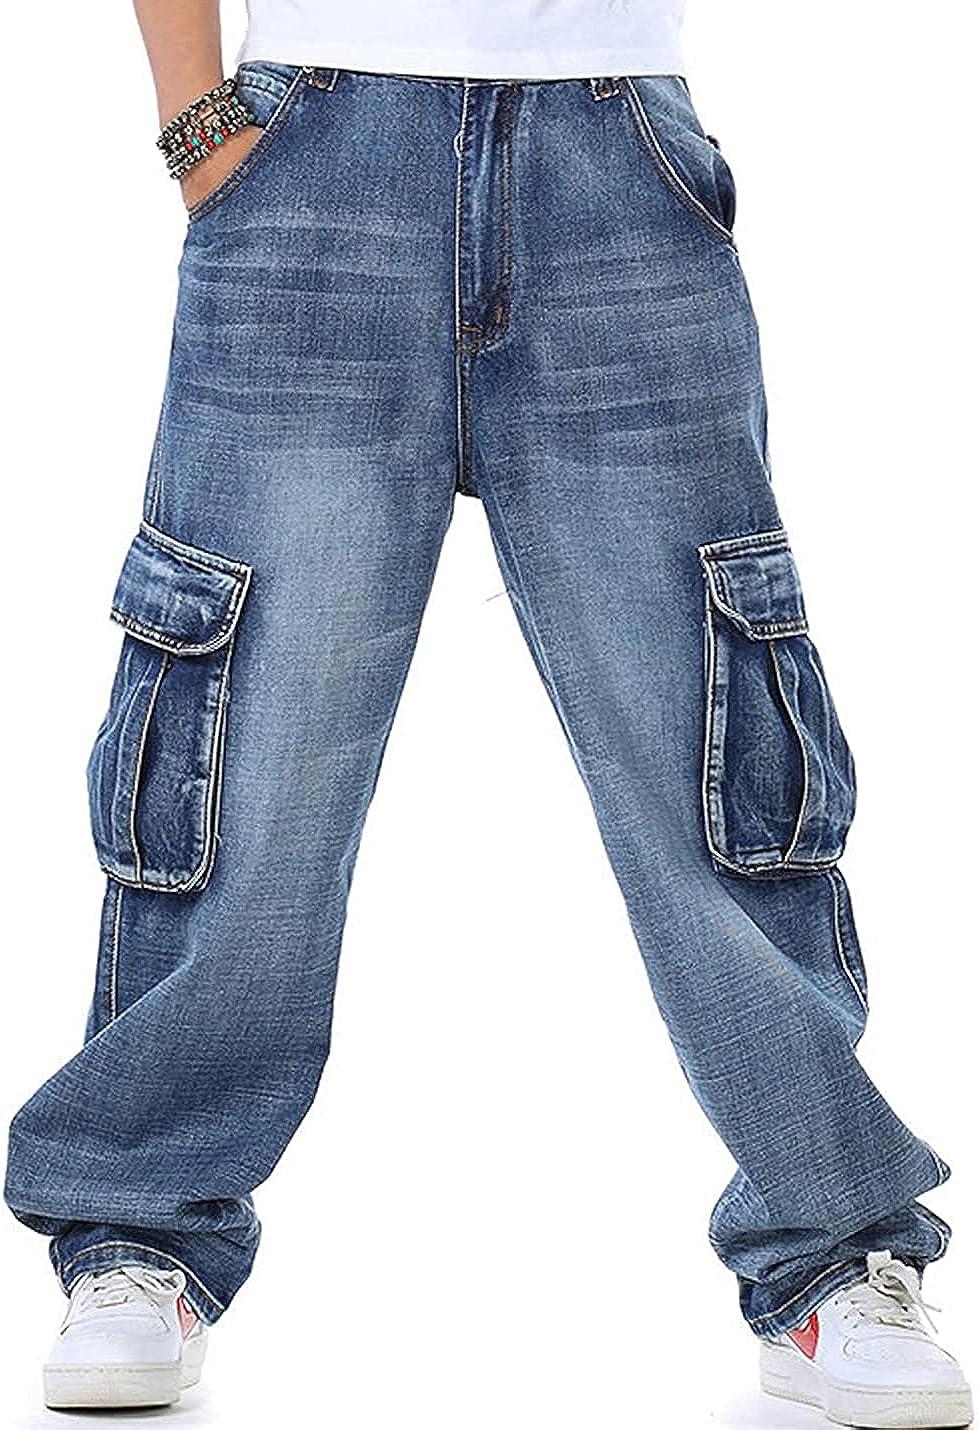 SOMYFLYY Men's Relaxed Fit Cargo Jeans - Stretch Straight Leg Multi-Pockets Outdoor Denim Work Cargo Pants